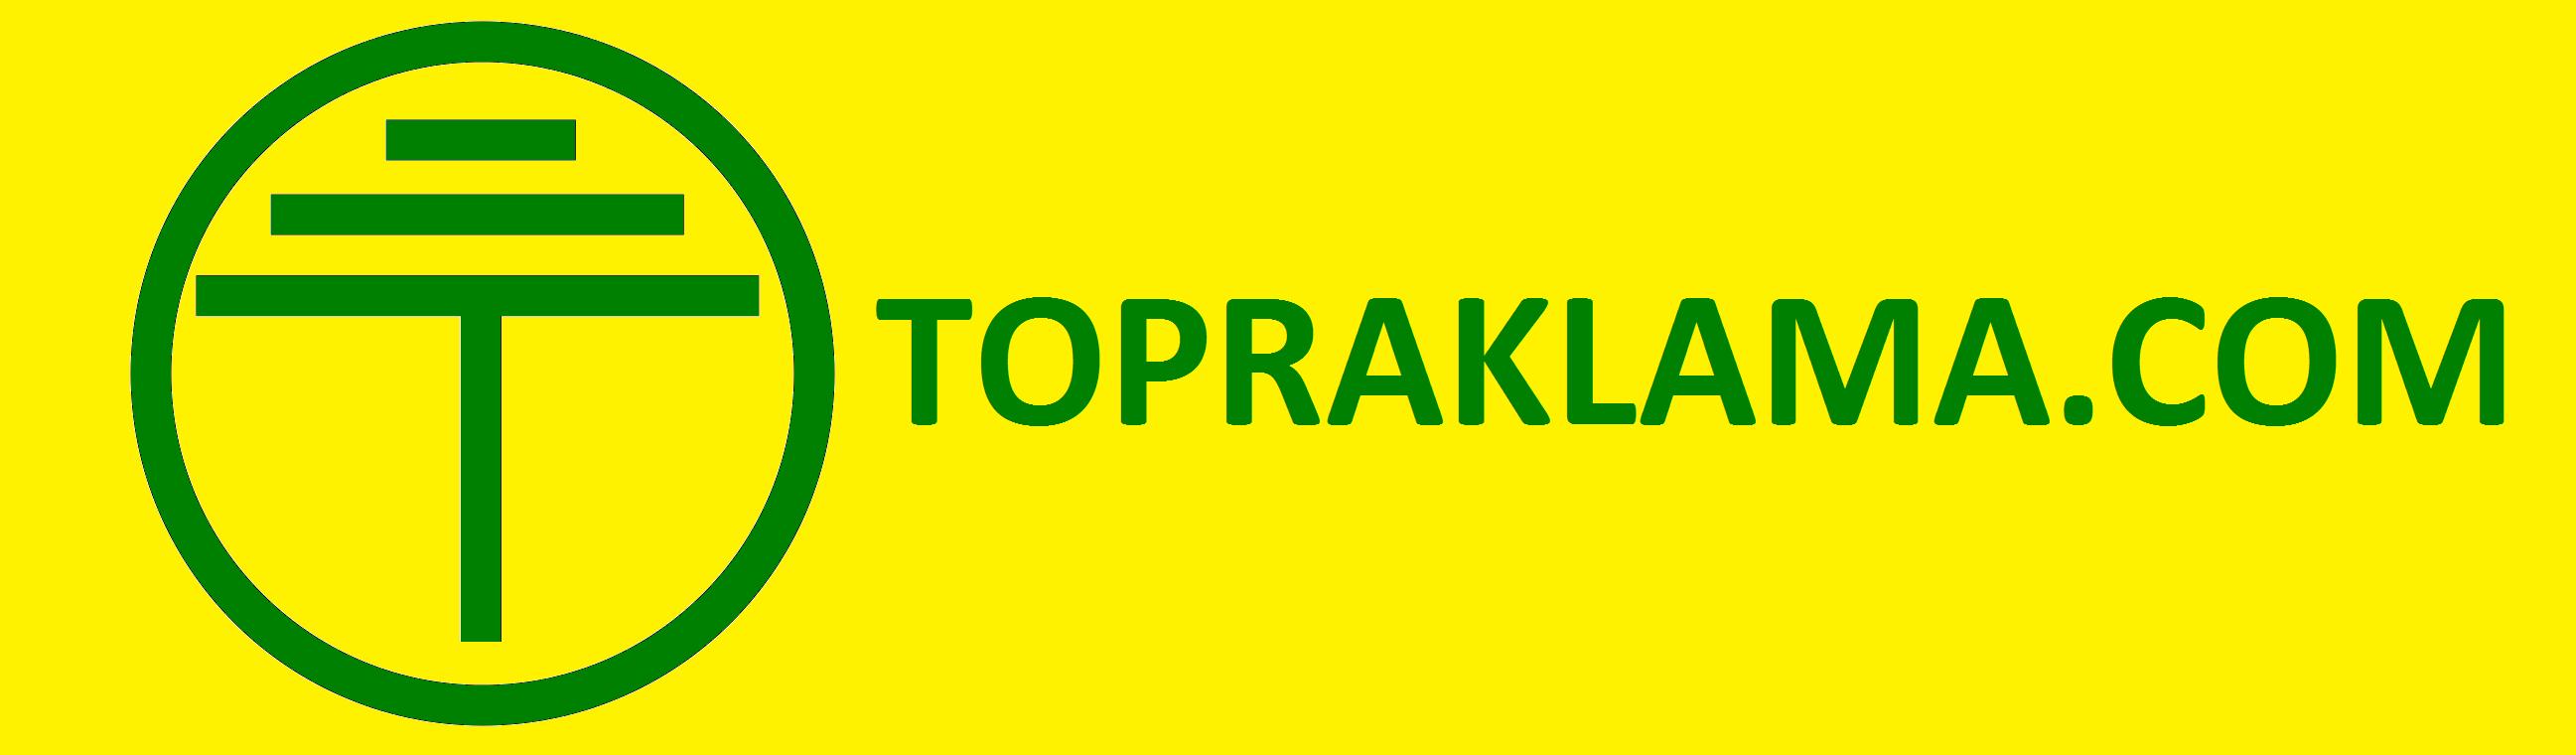 Topraklama Logo 2